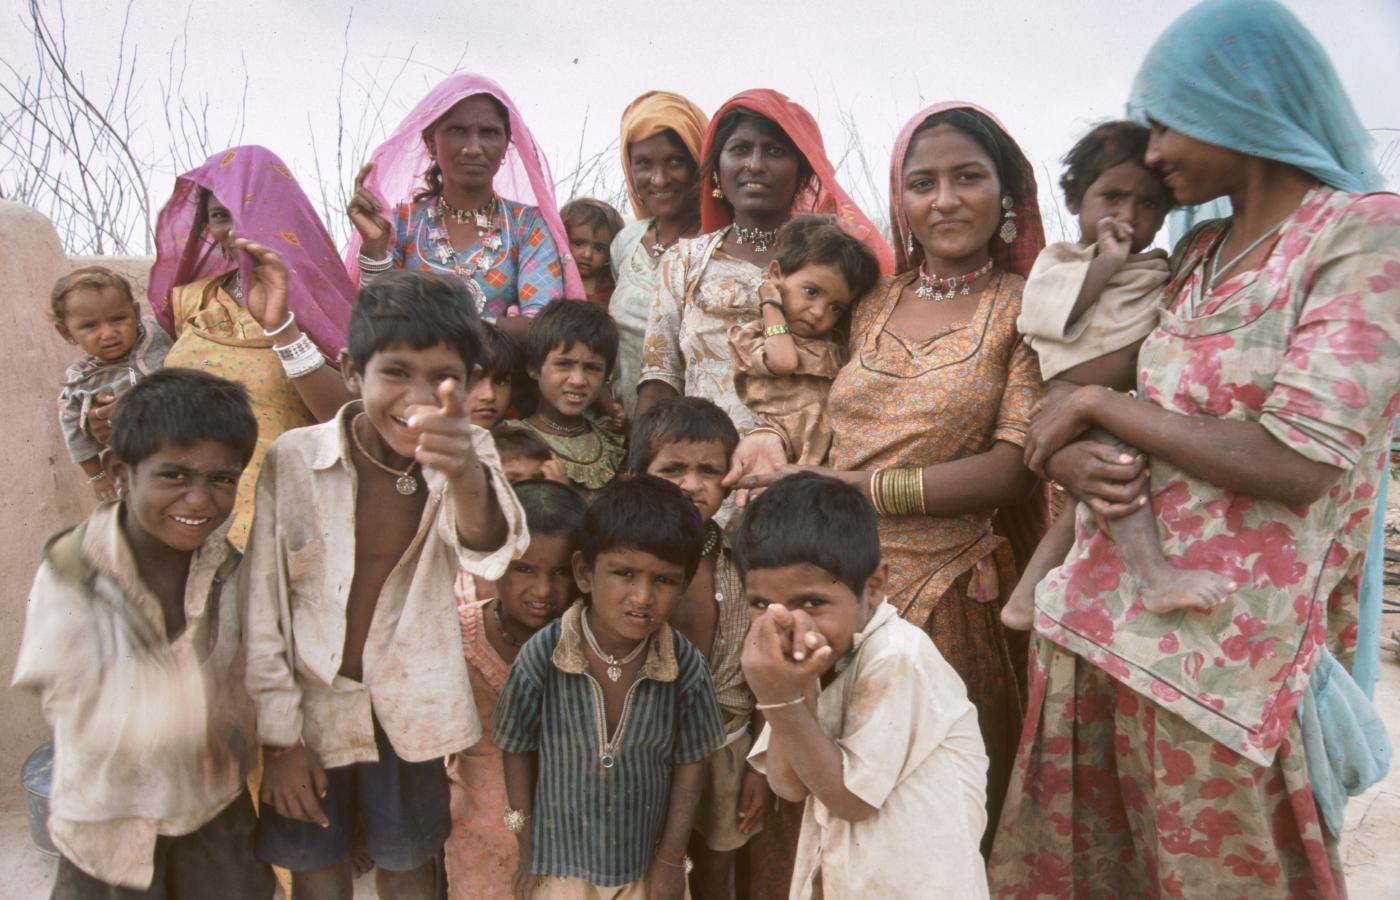 family-portrait-in-the-desert-around-jaisalmer-2003